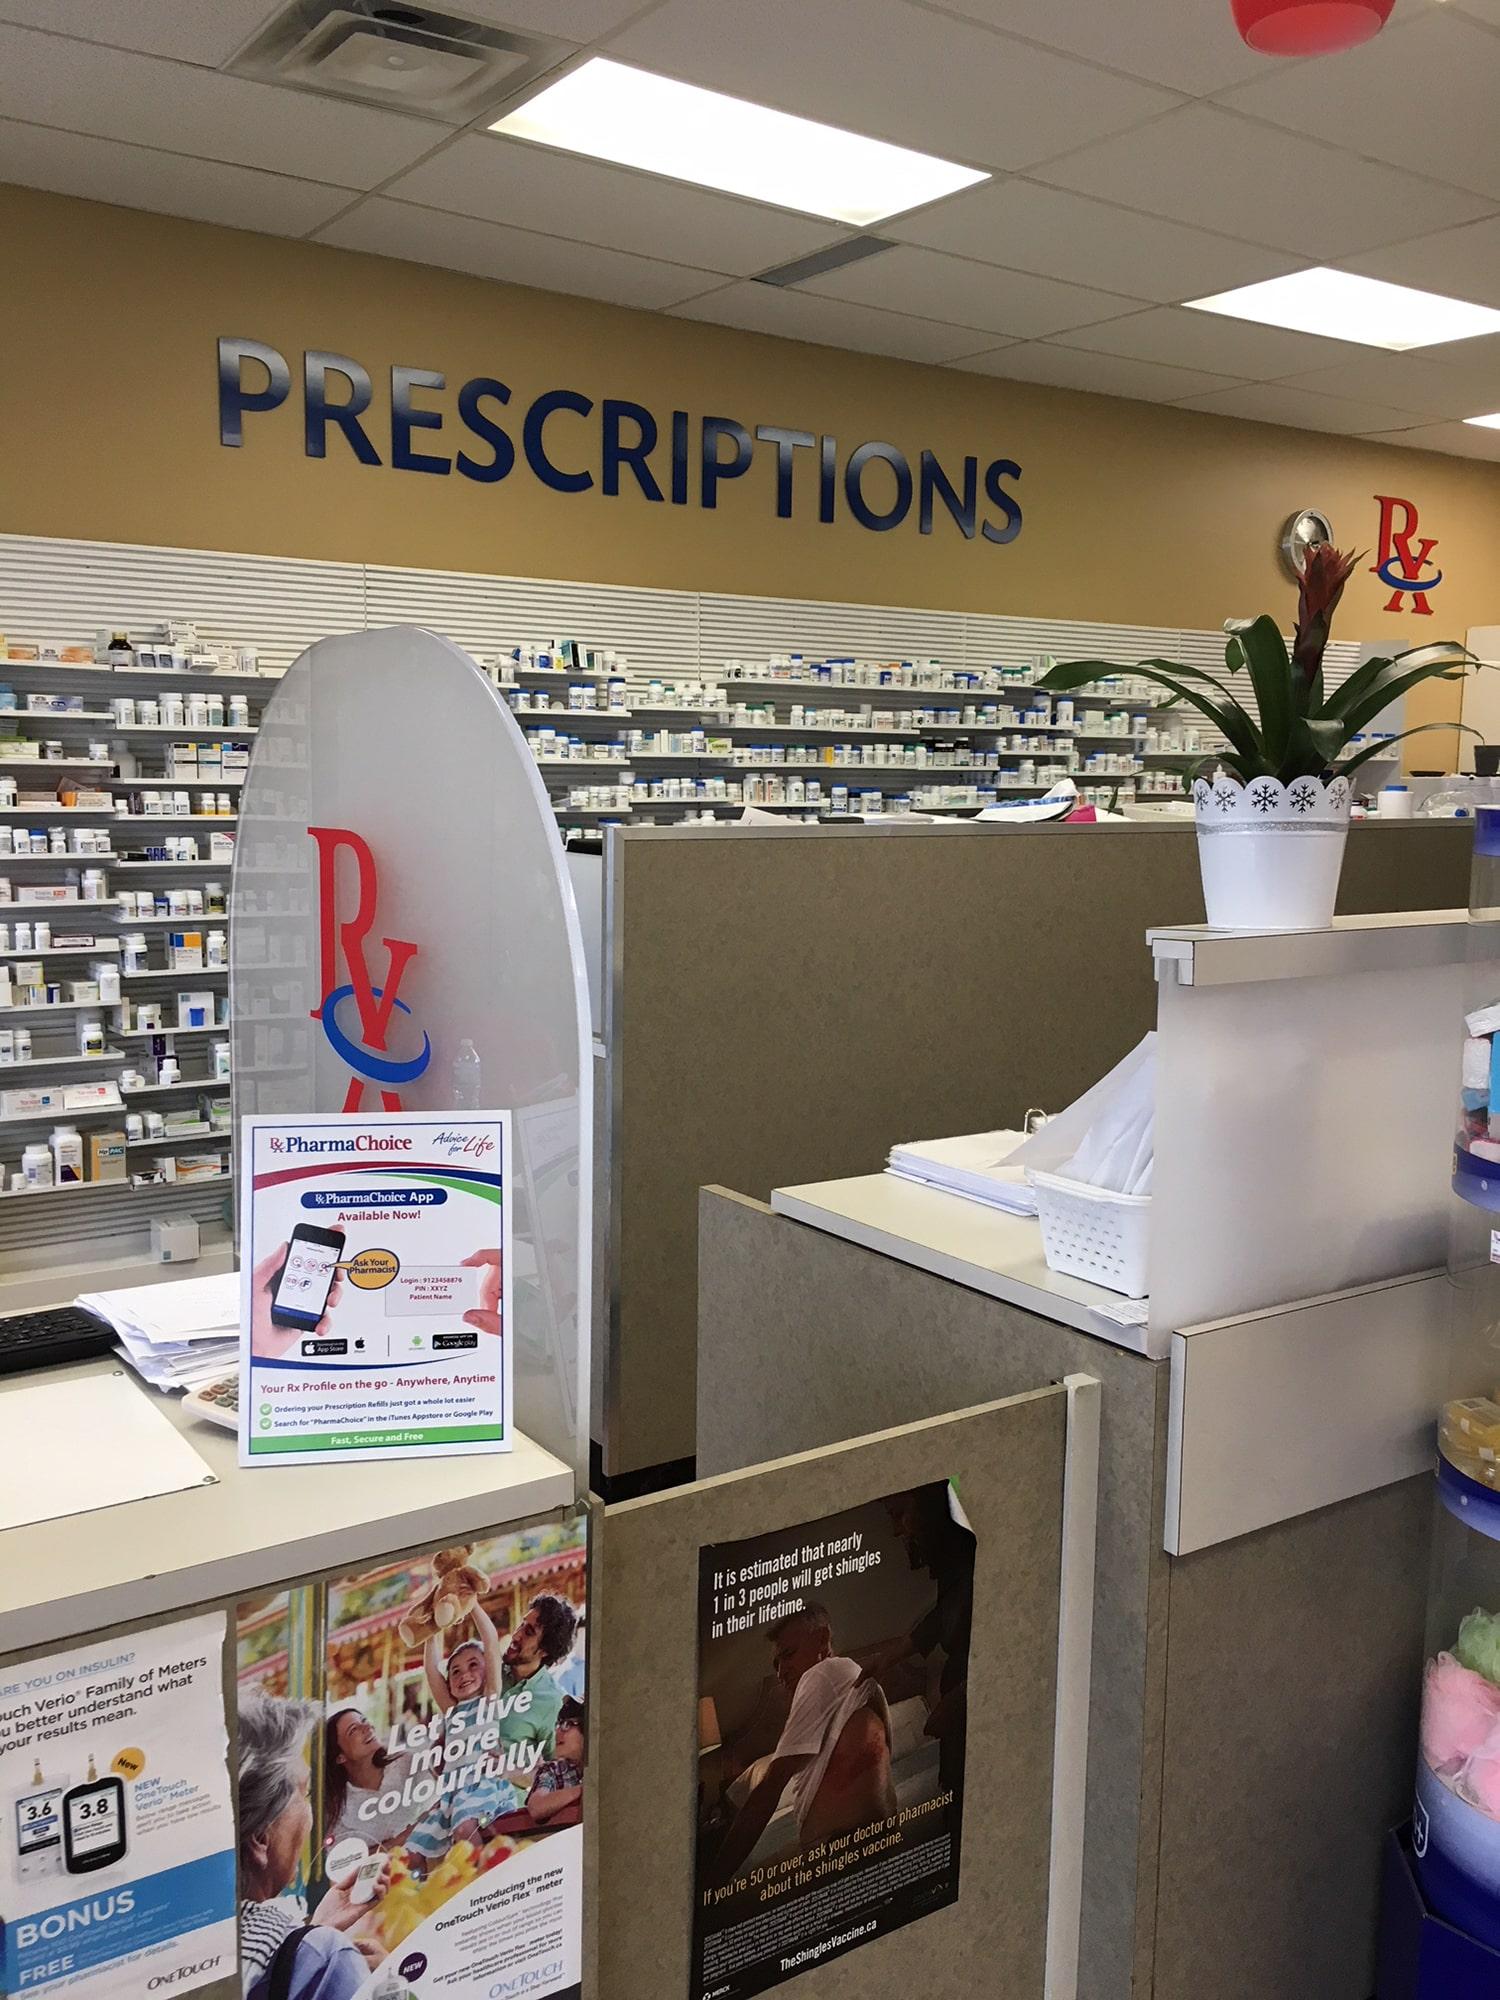 People's Hamilton prescriptions